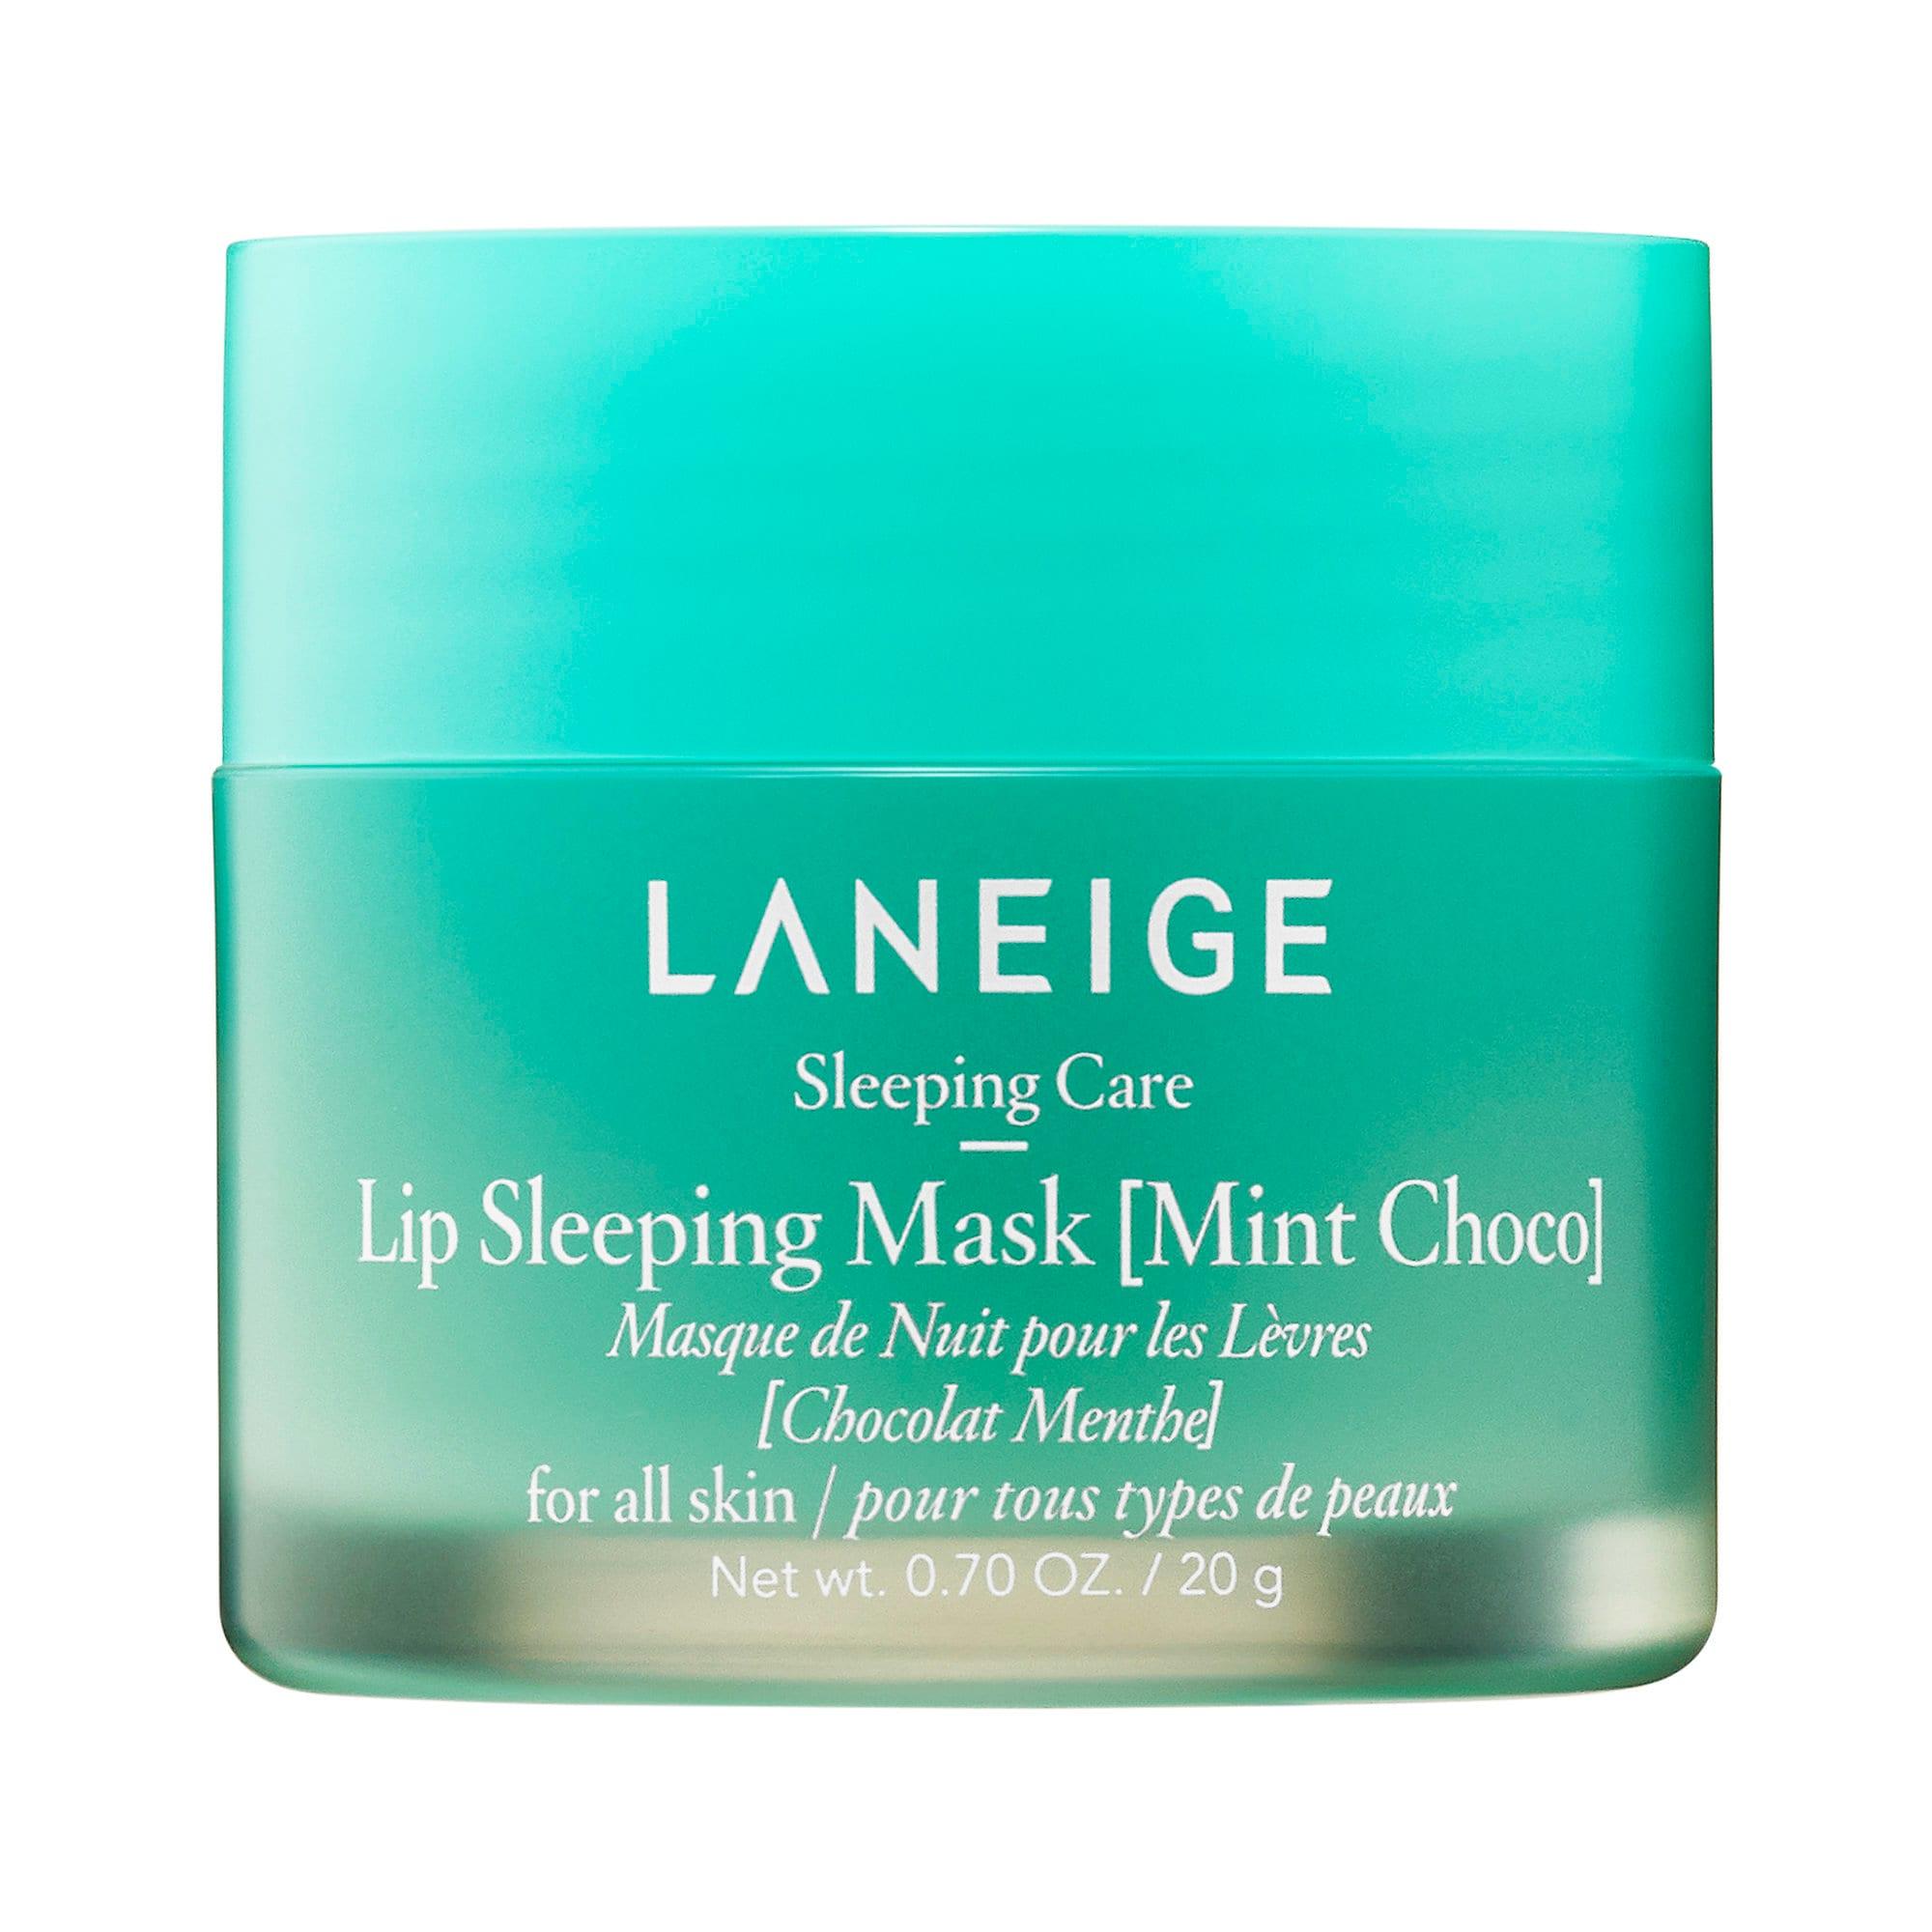 Laneige - Limited Edition Lip Sleeping Mask